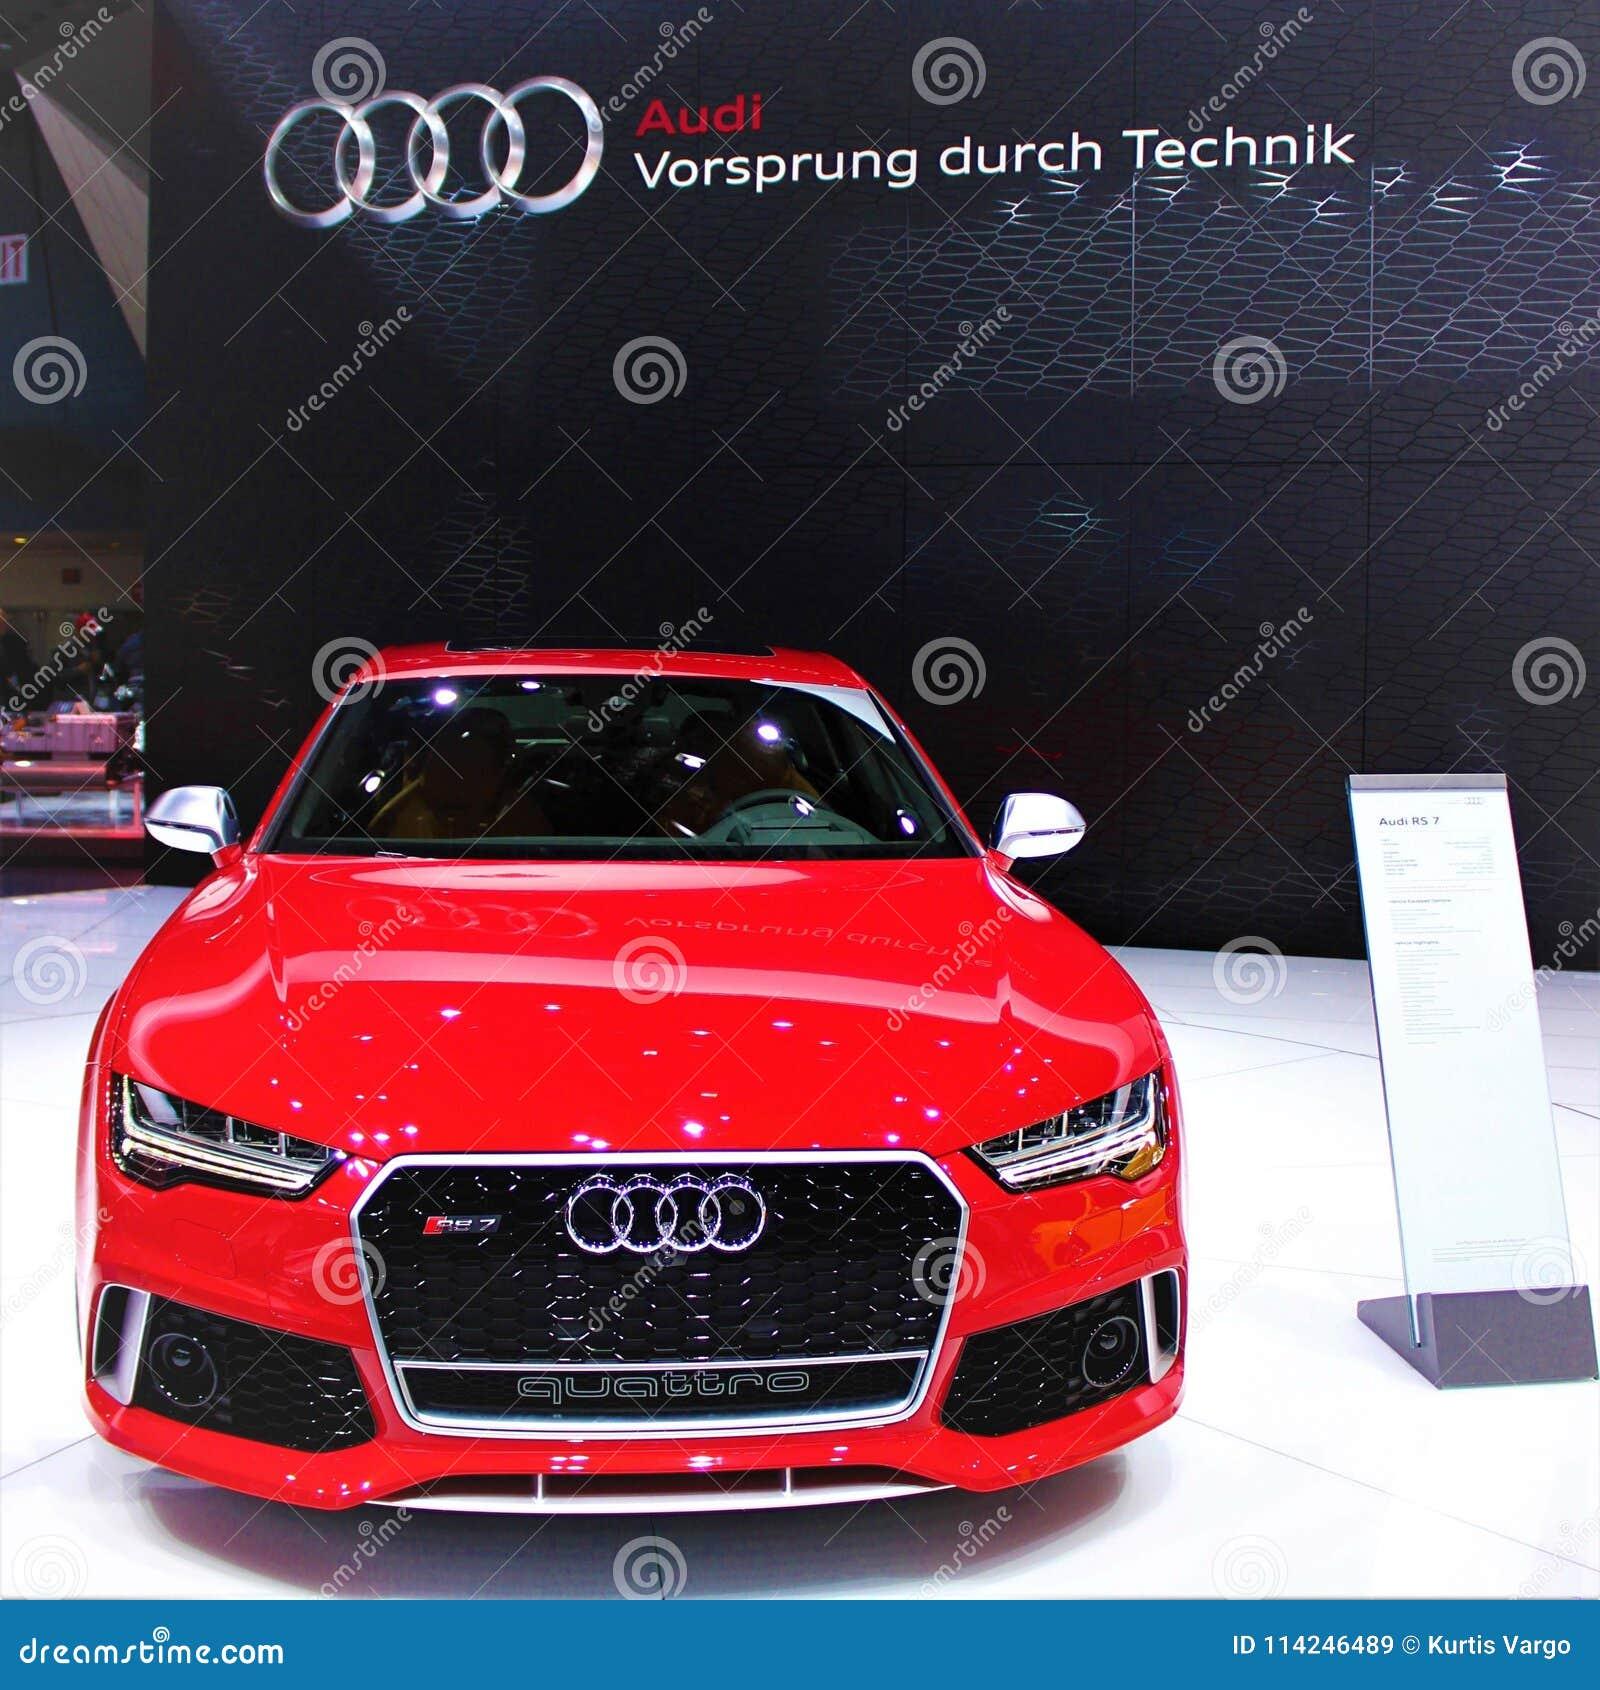 2015 Audi RS 7 Quattro at Detroit Auto Show